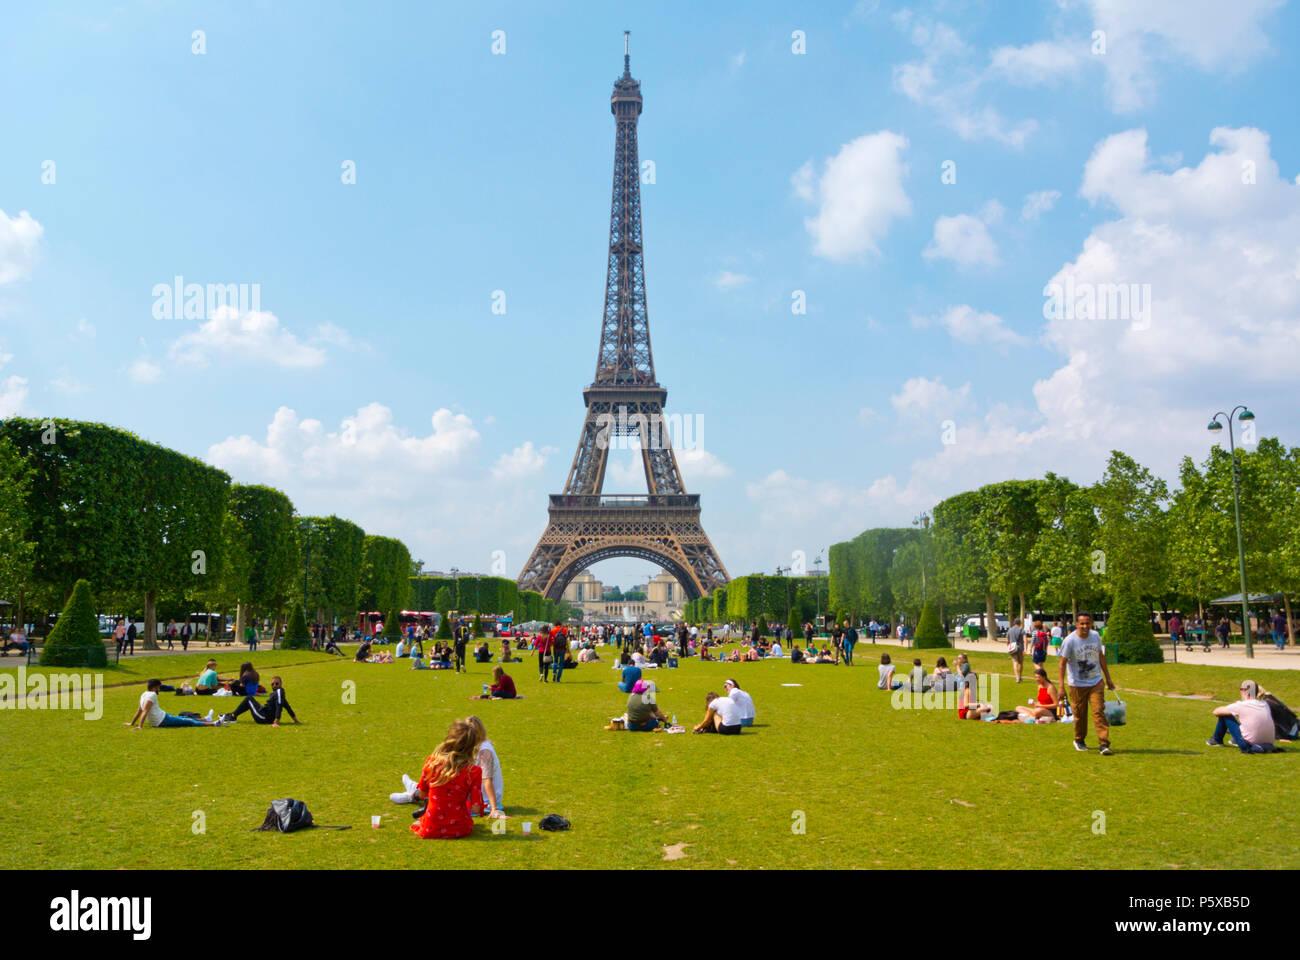 Eiffel tower, seen from Champ de Mars, Paris, France - Stock Image